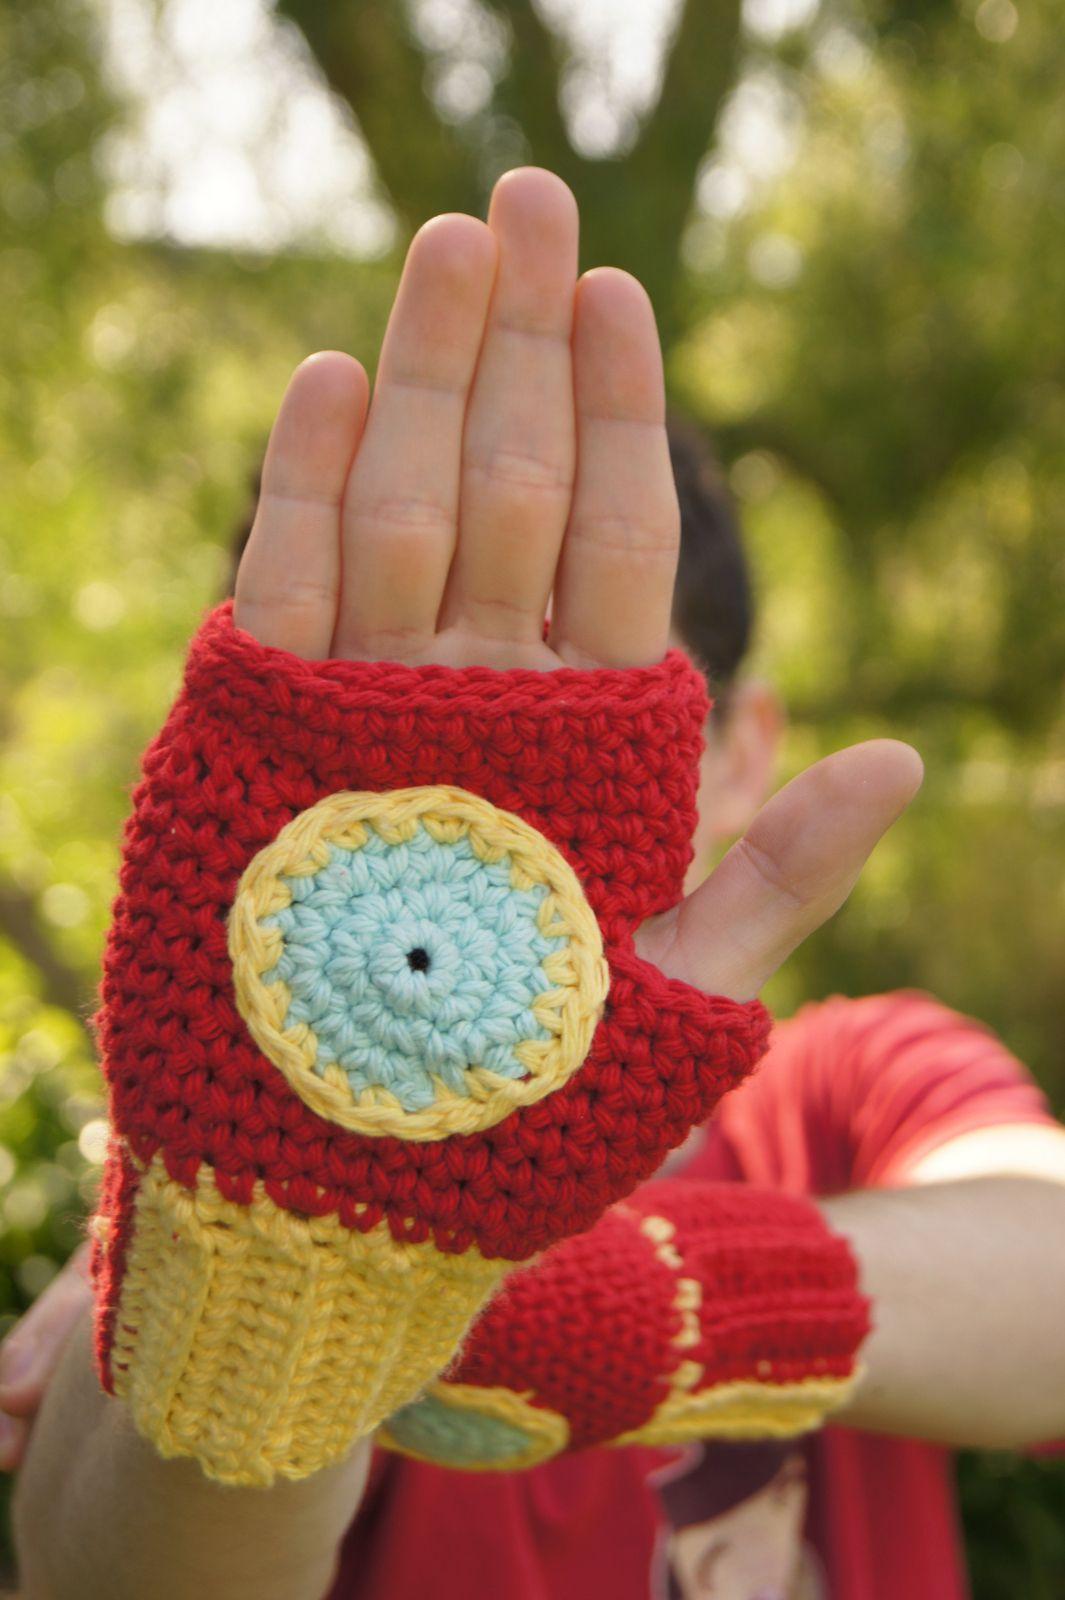 Crocheted Iron Man Gloves | Handarbeiten und Häkeln